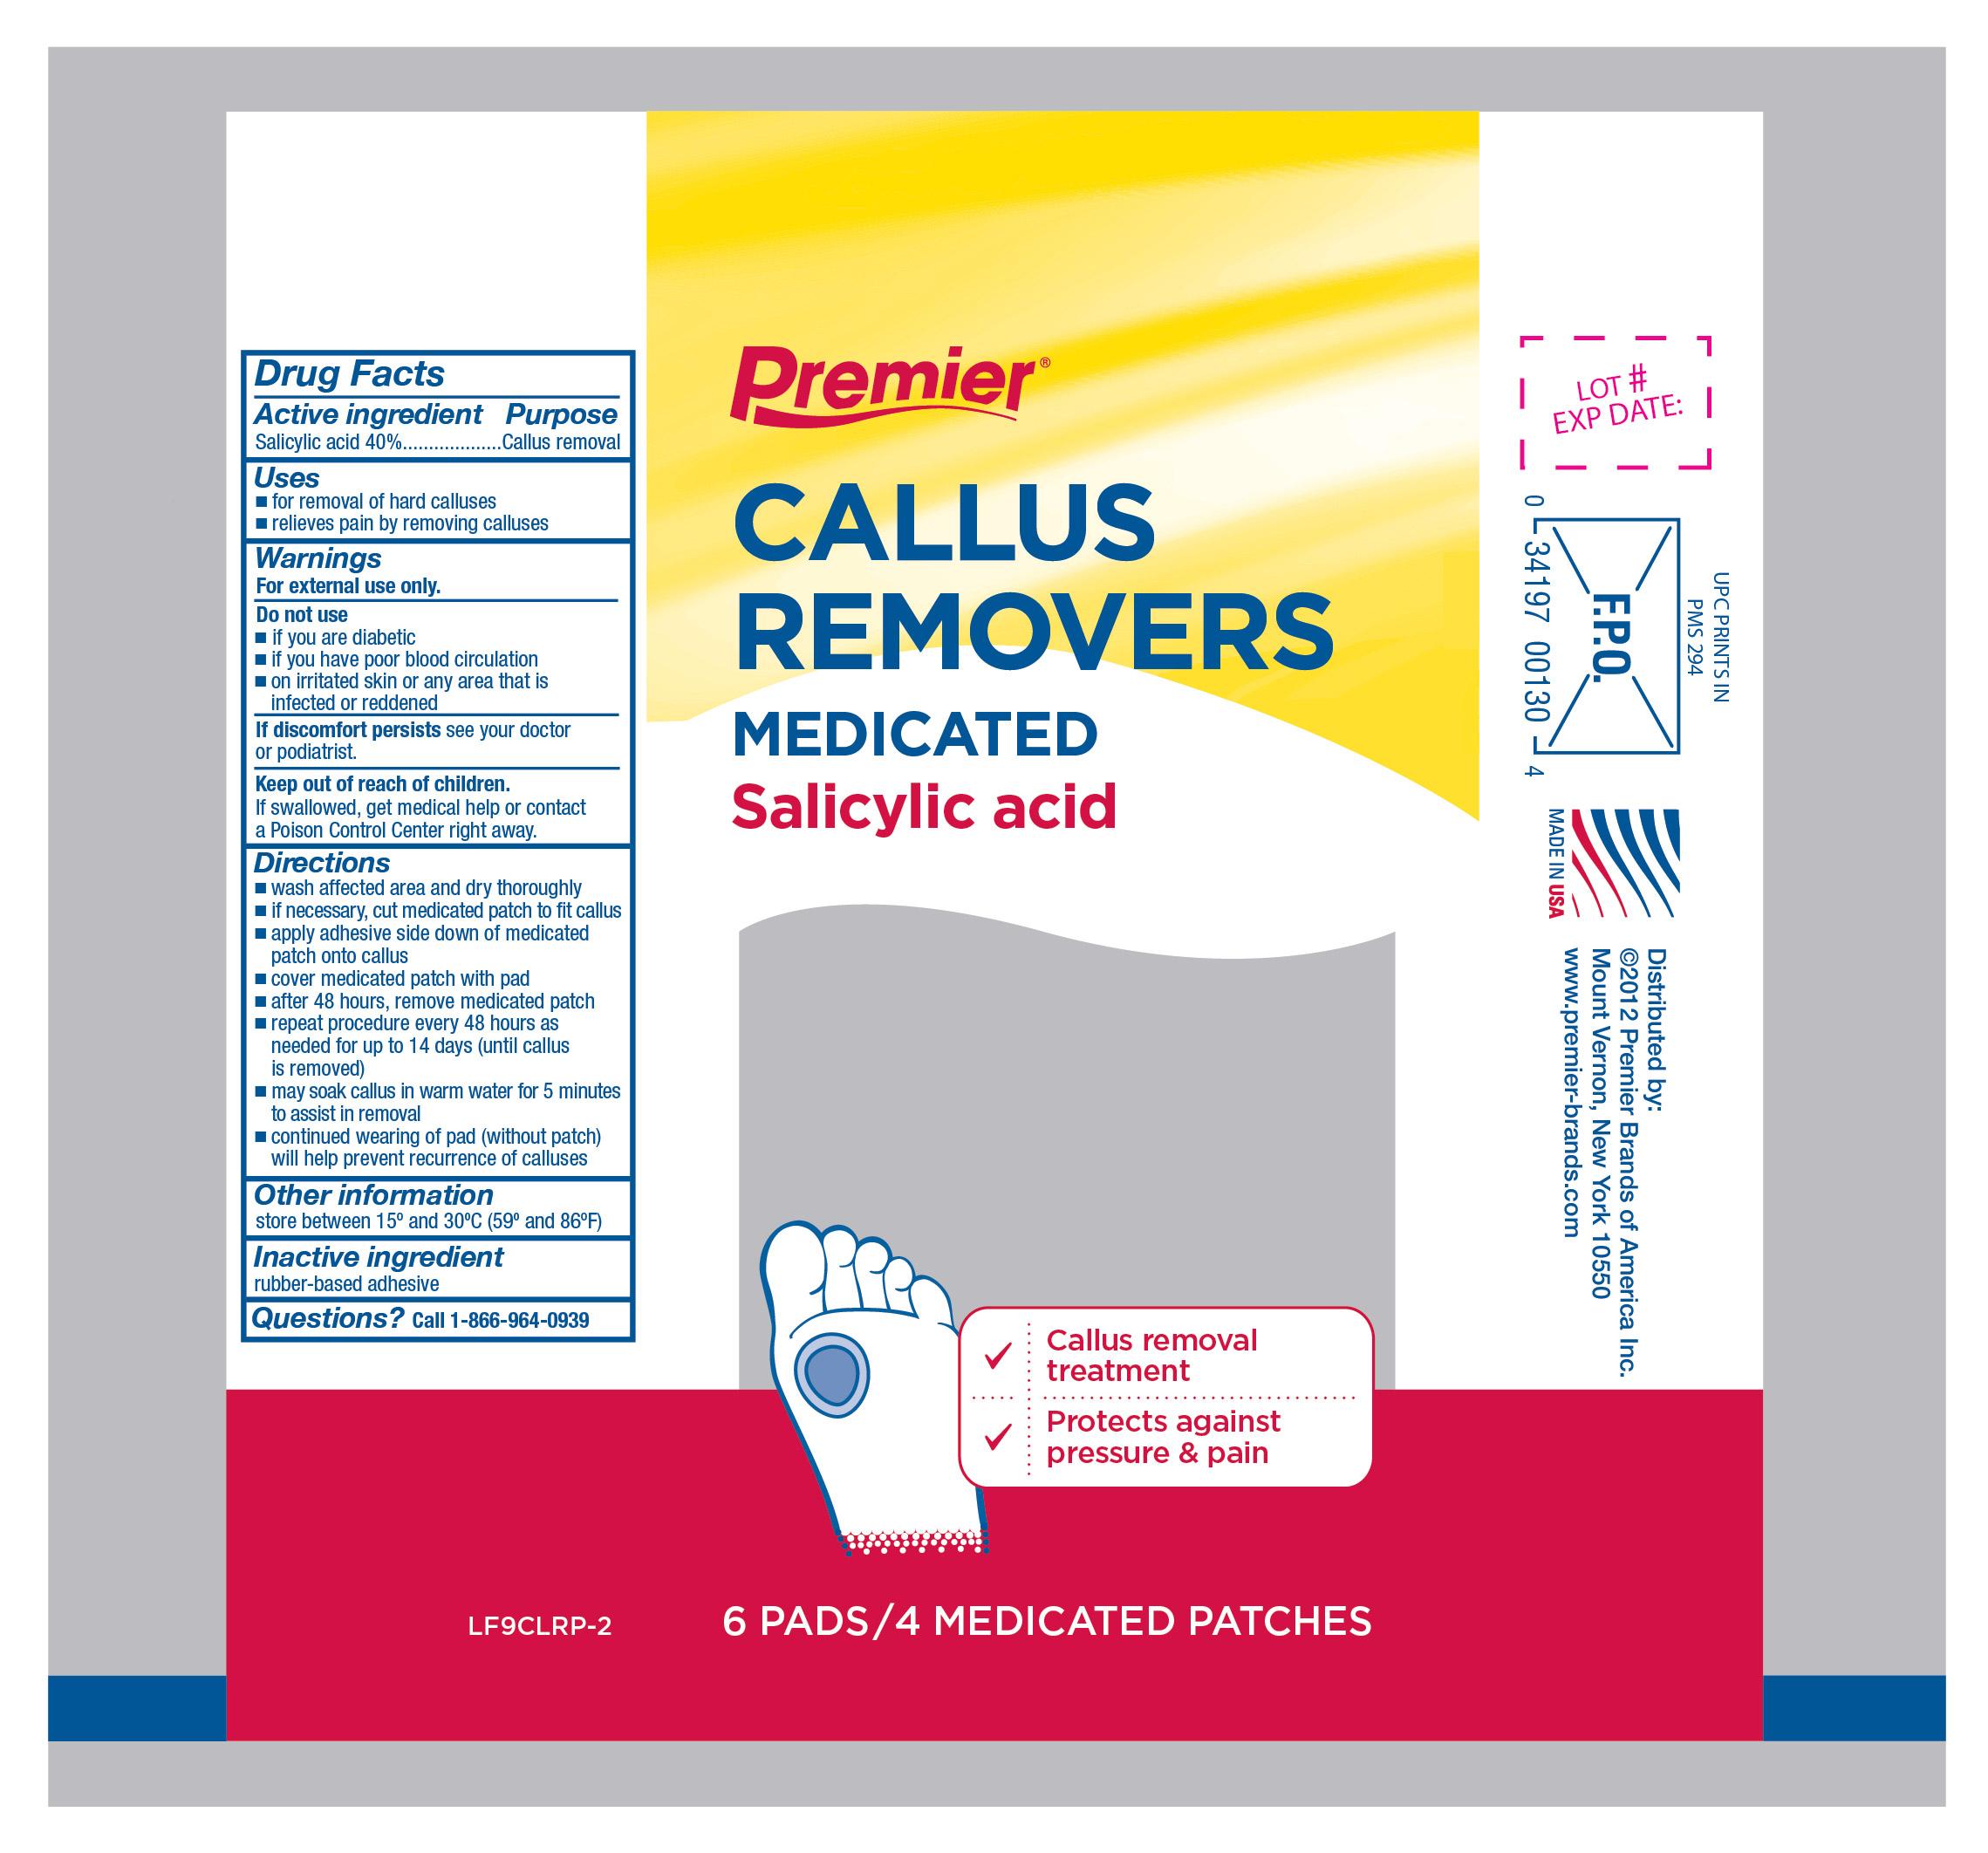 PREMIER_Callus Removers_LF9CLRP-2-01.jpg